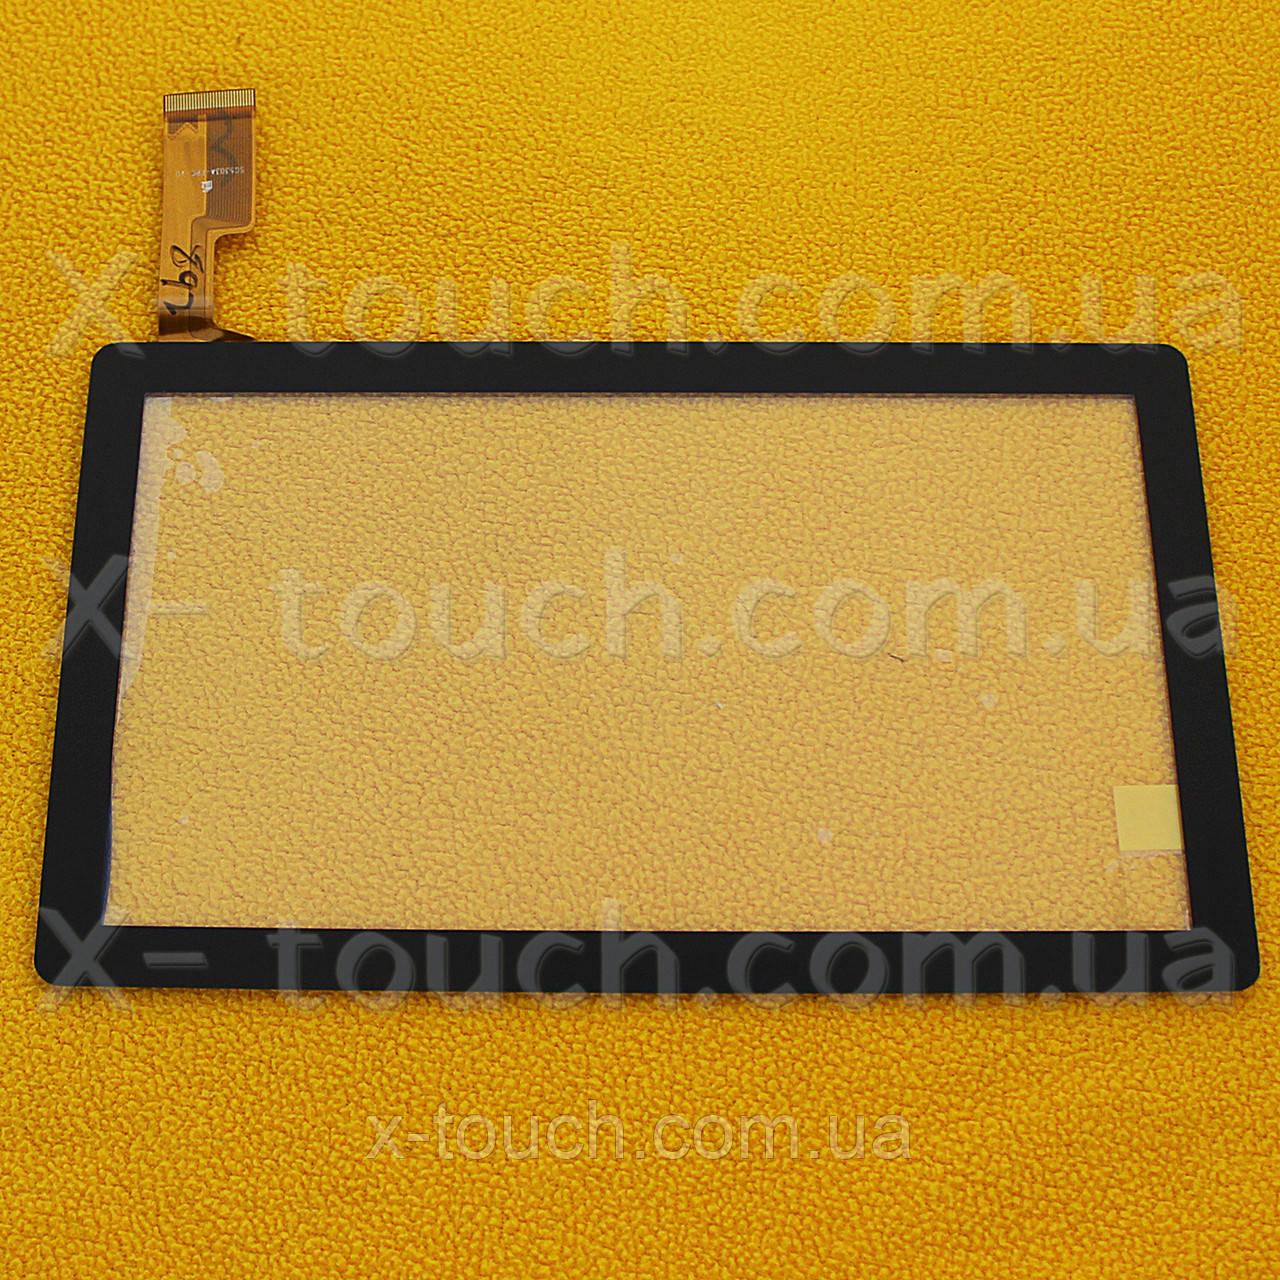 Тачскрин, сенсор Uni Pad  Verico CM-USP03A-13QD  для планшета